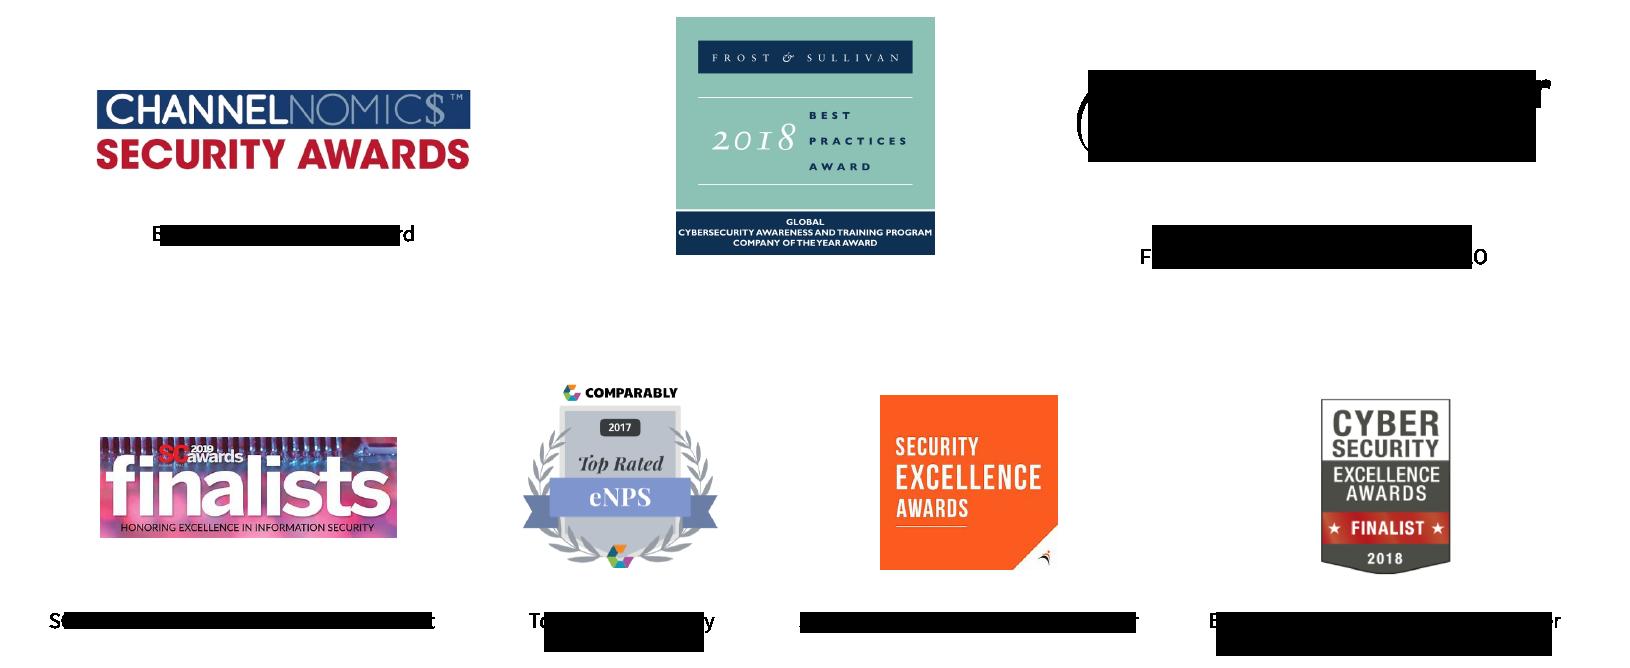 Smart Security Awareness Training - Cybersecurity Solutions - SmarTone